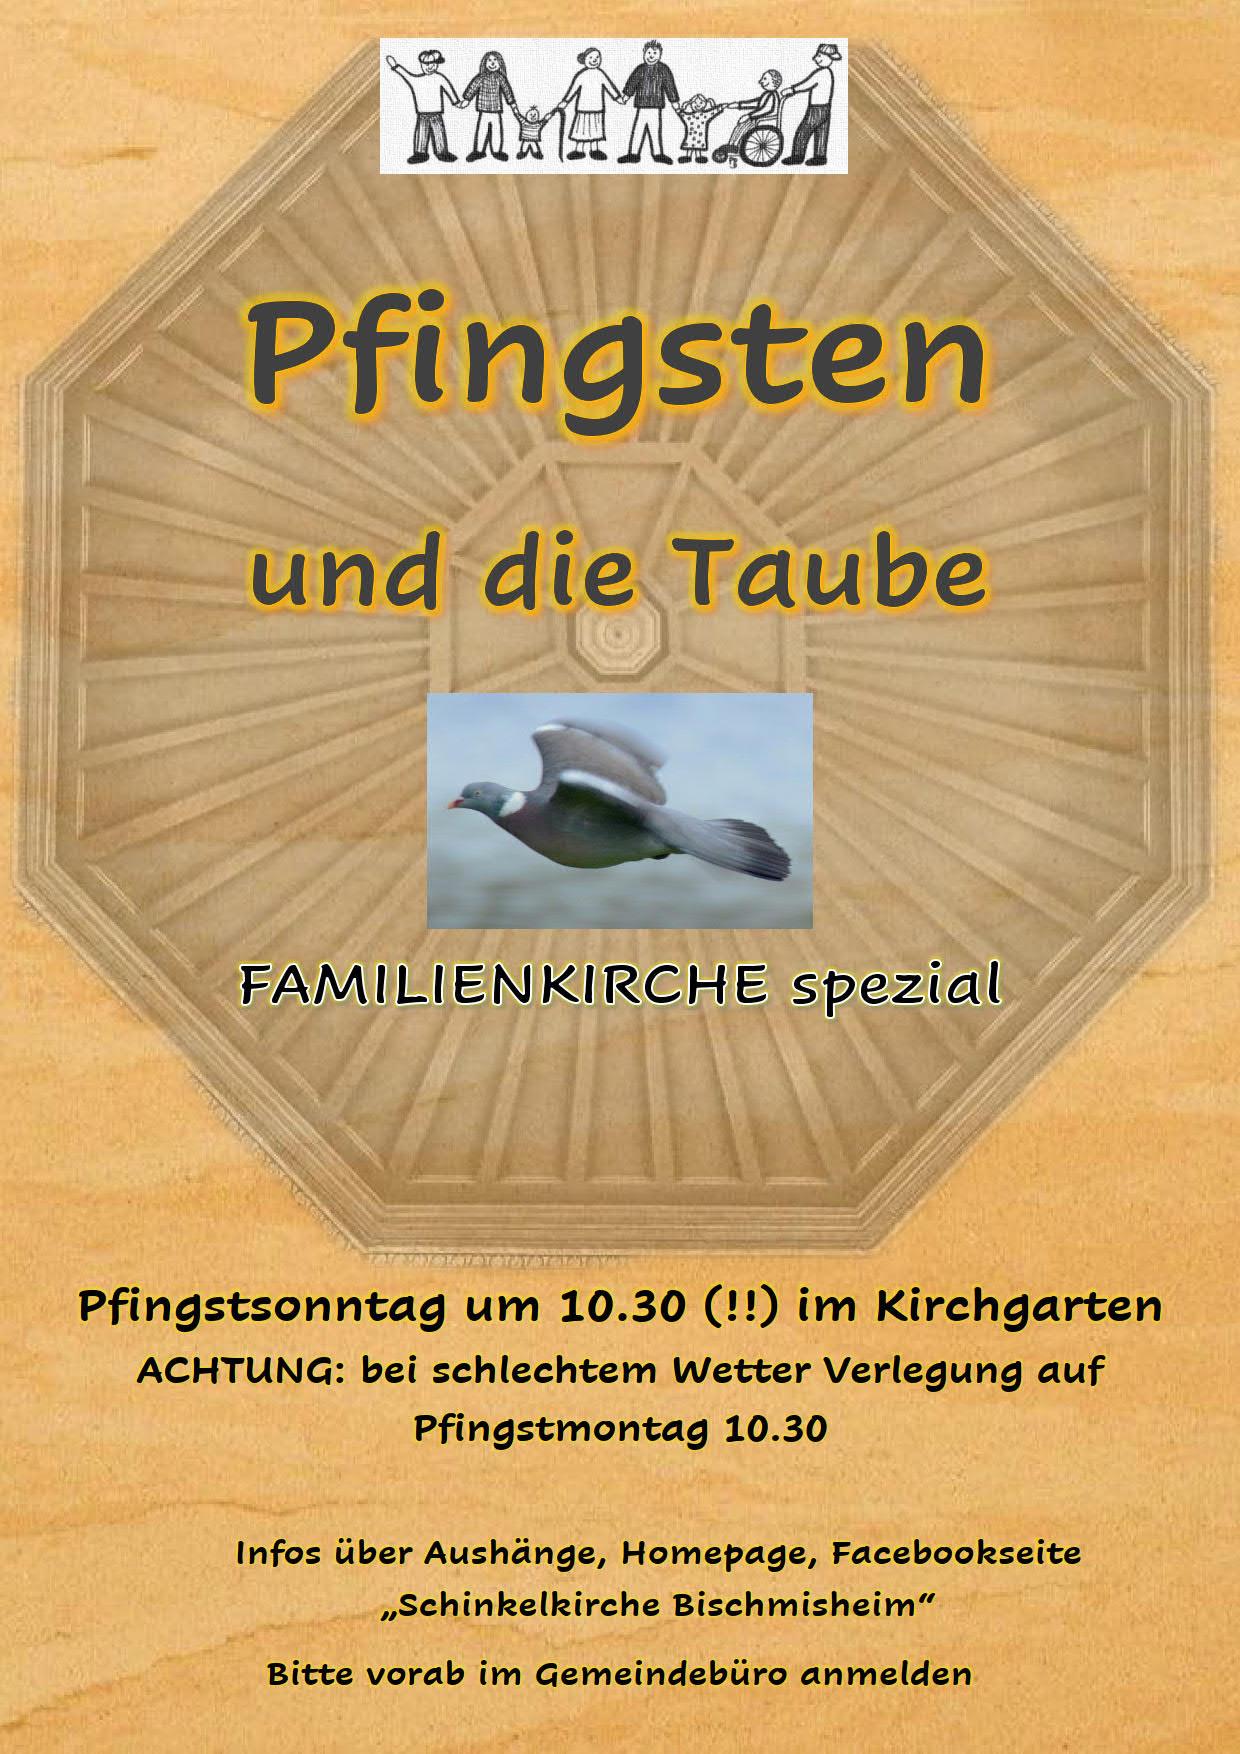 Pfingsten in Bischmisheim